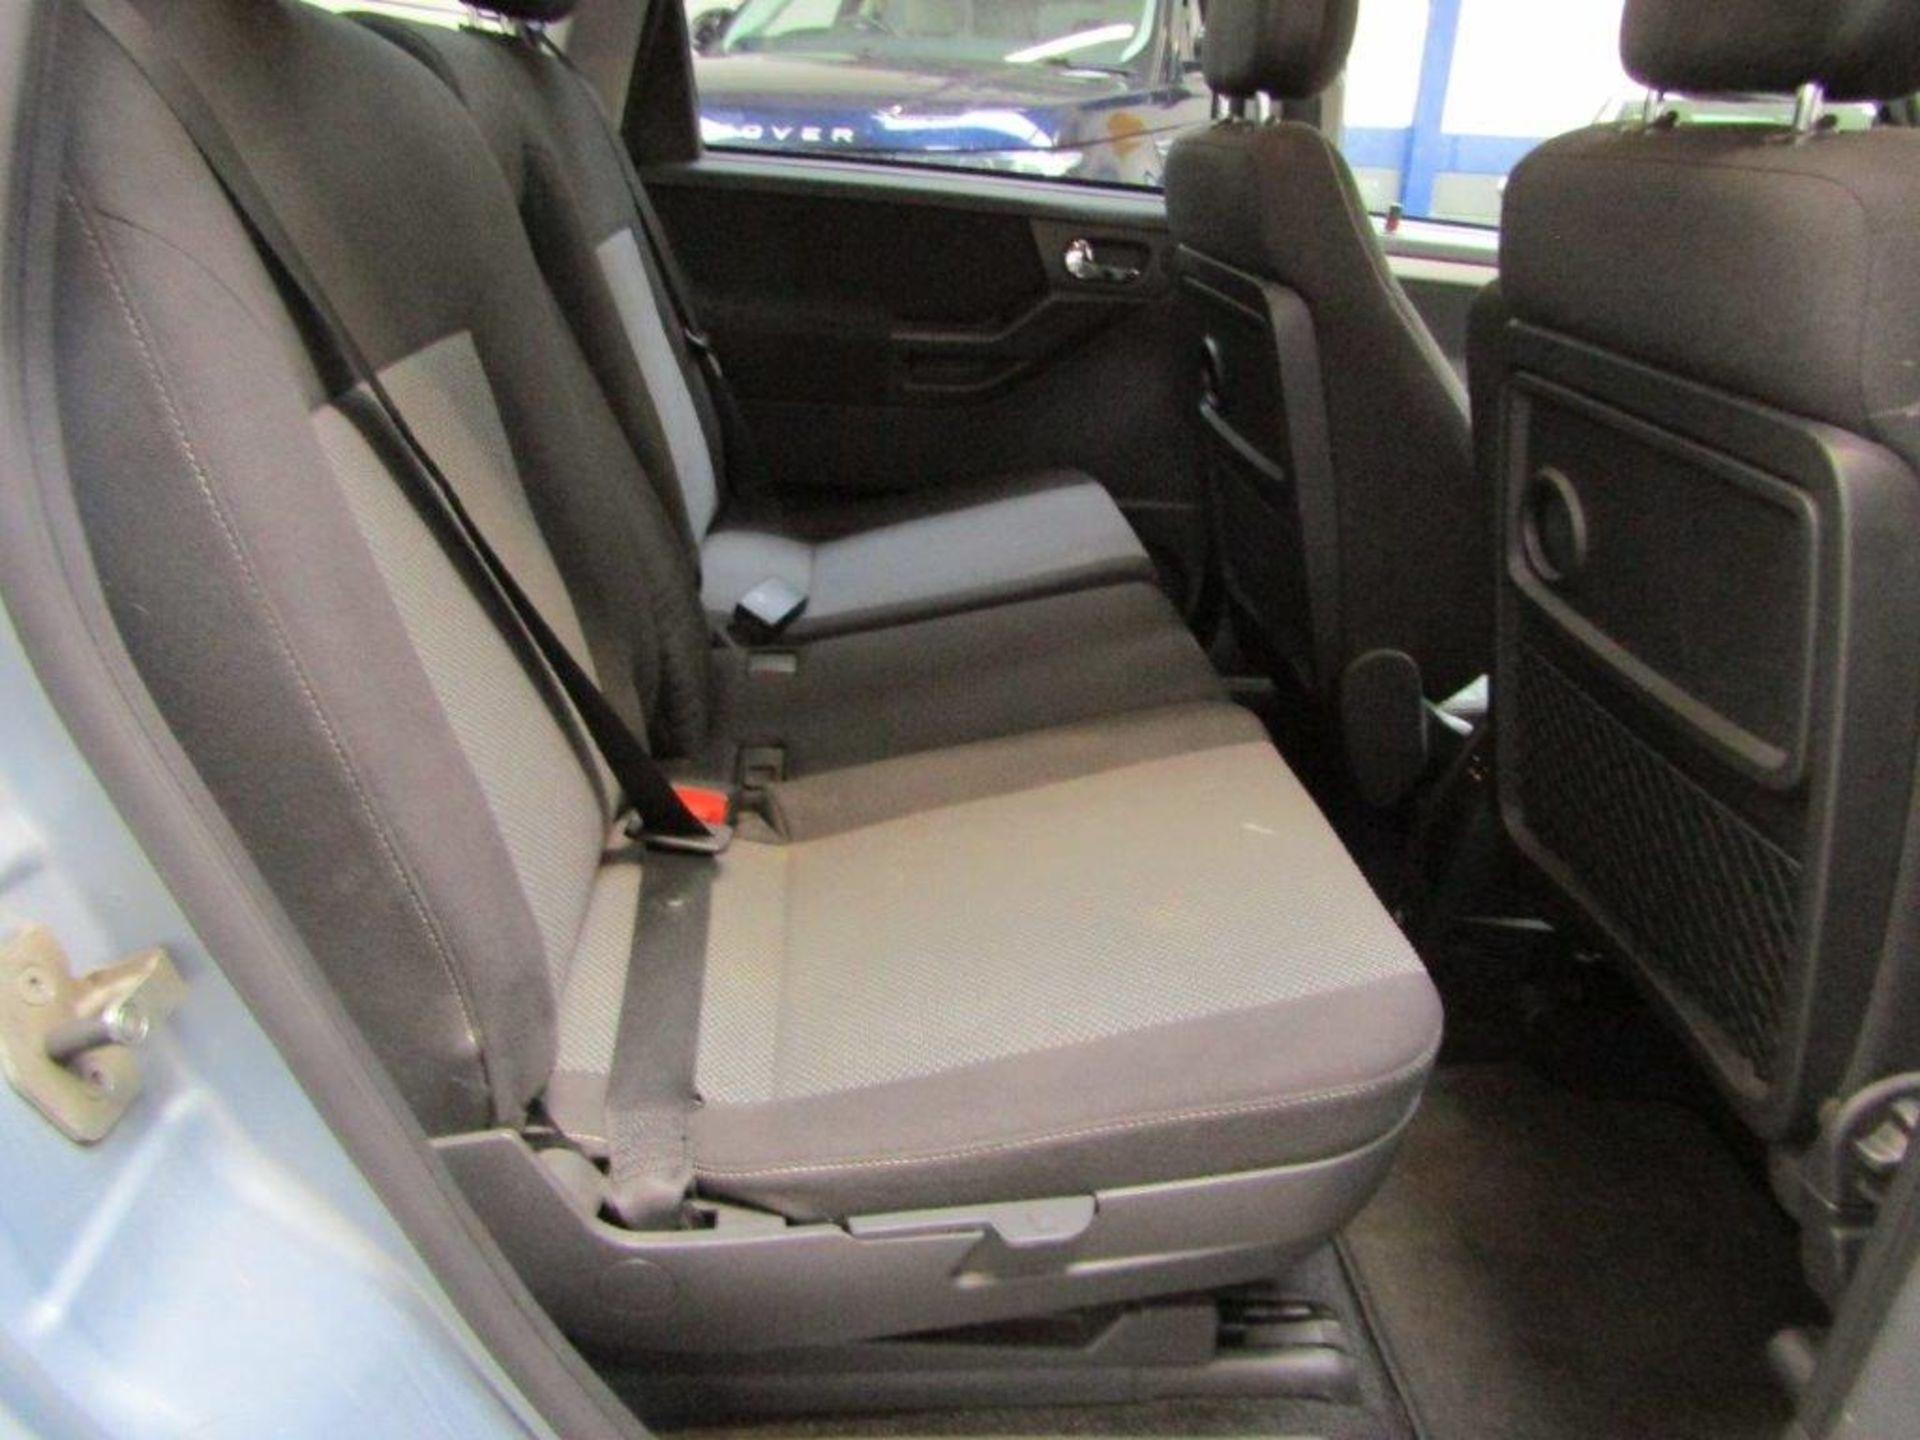 58 08 Vauxhall Meriva Design - Image 25 of 25